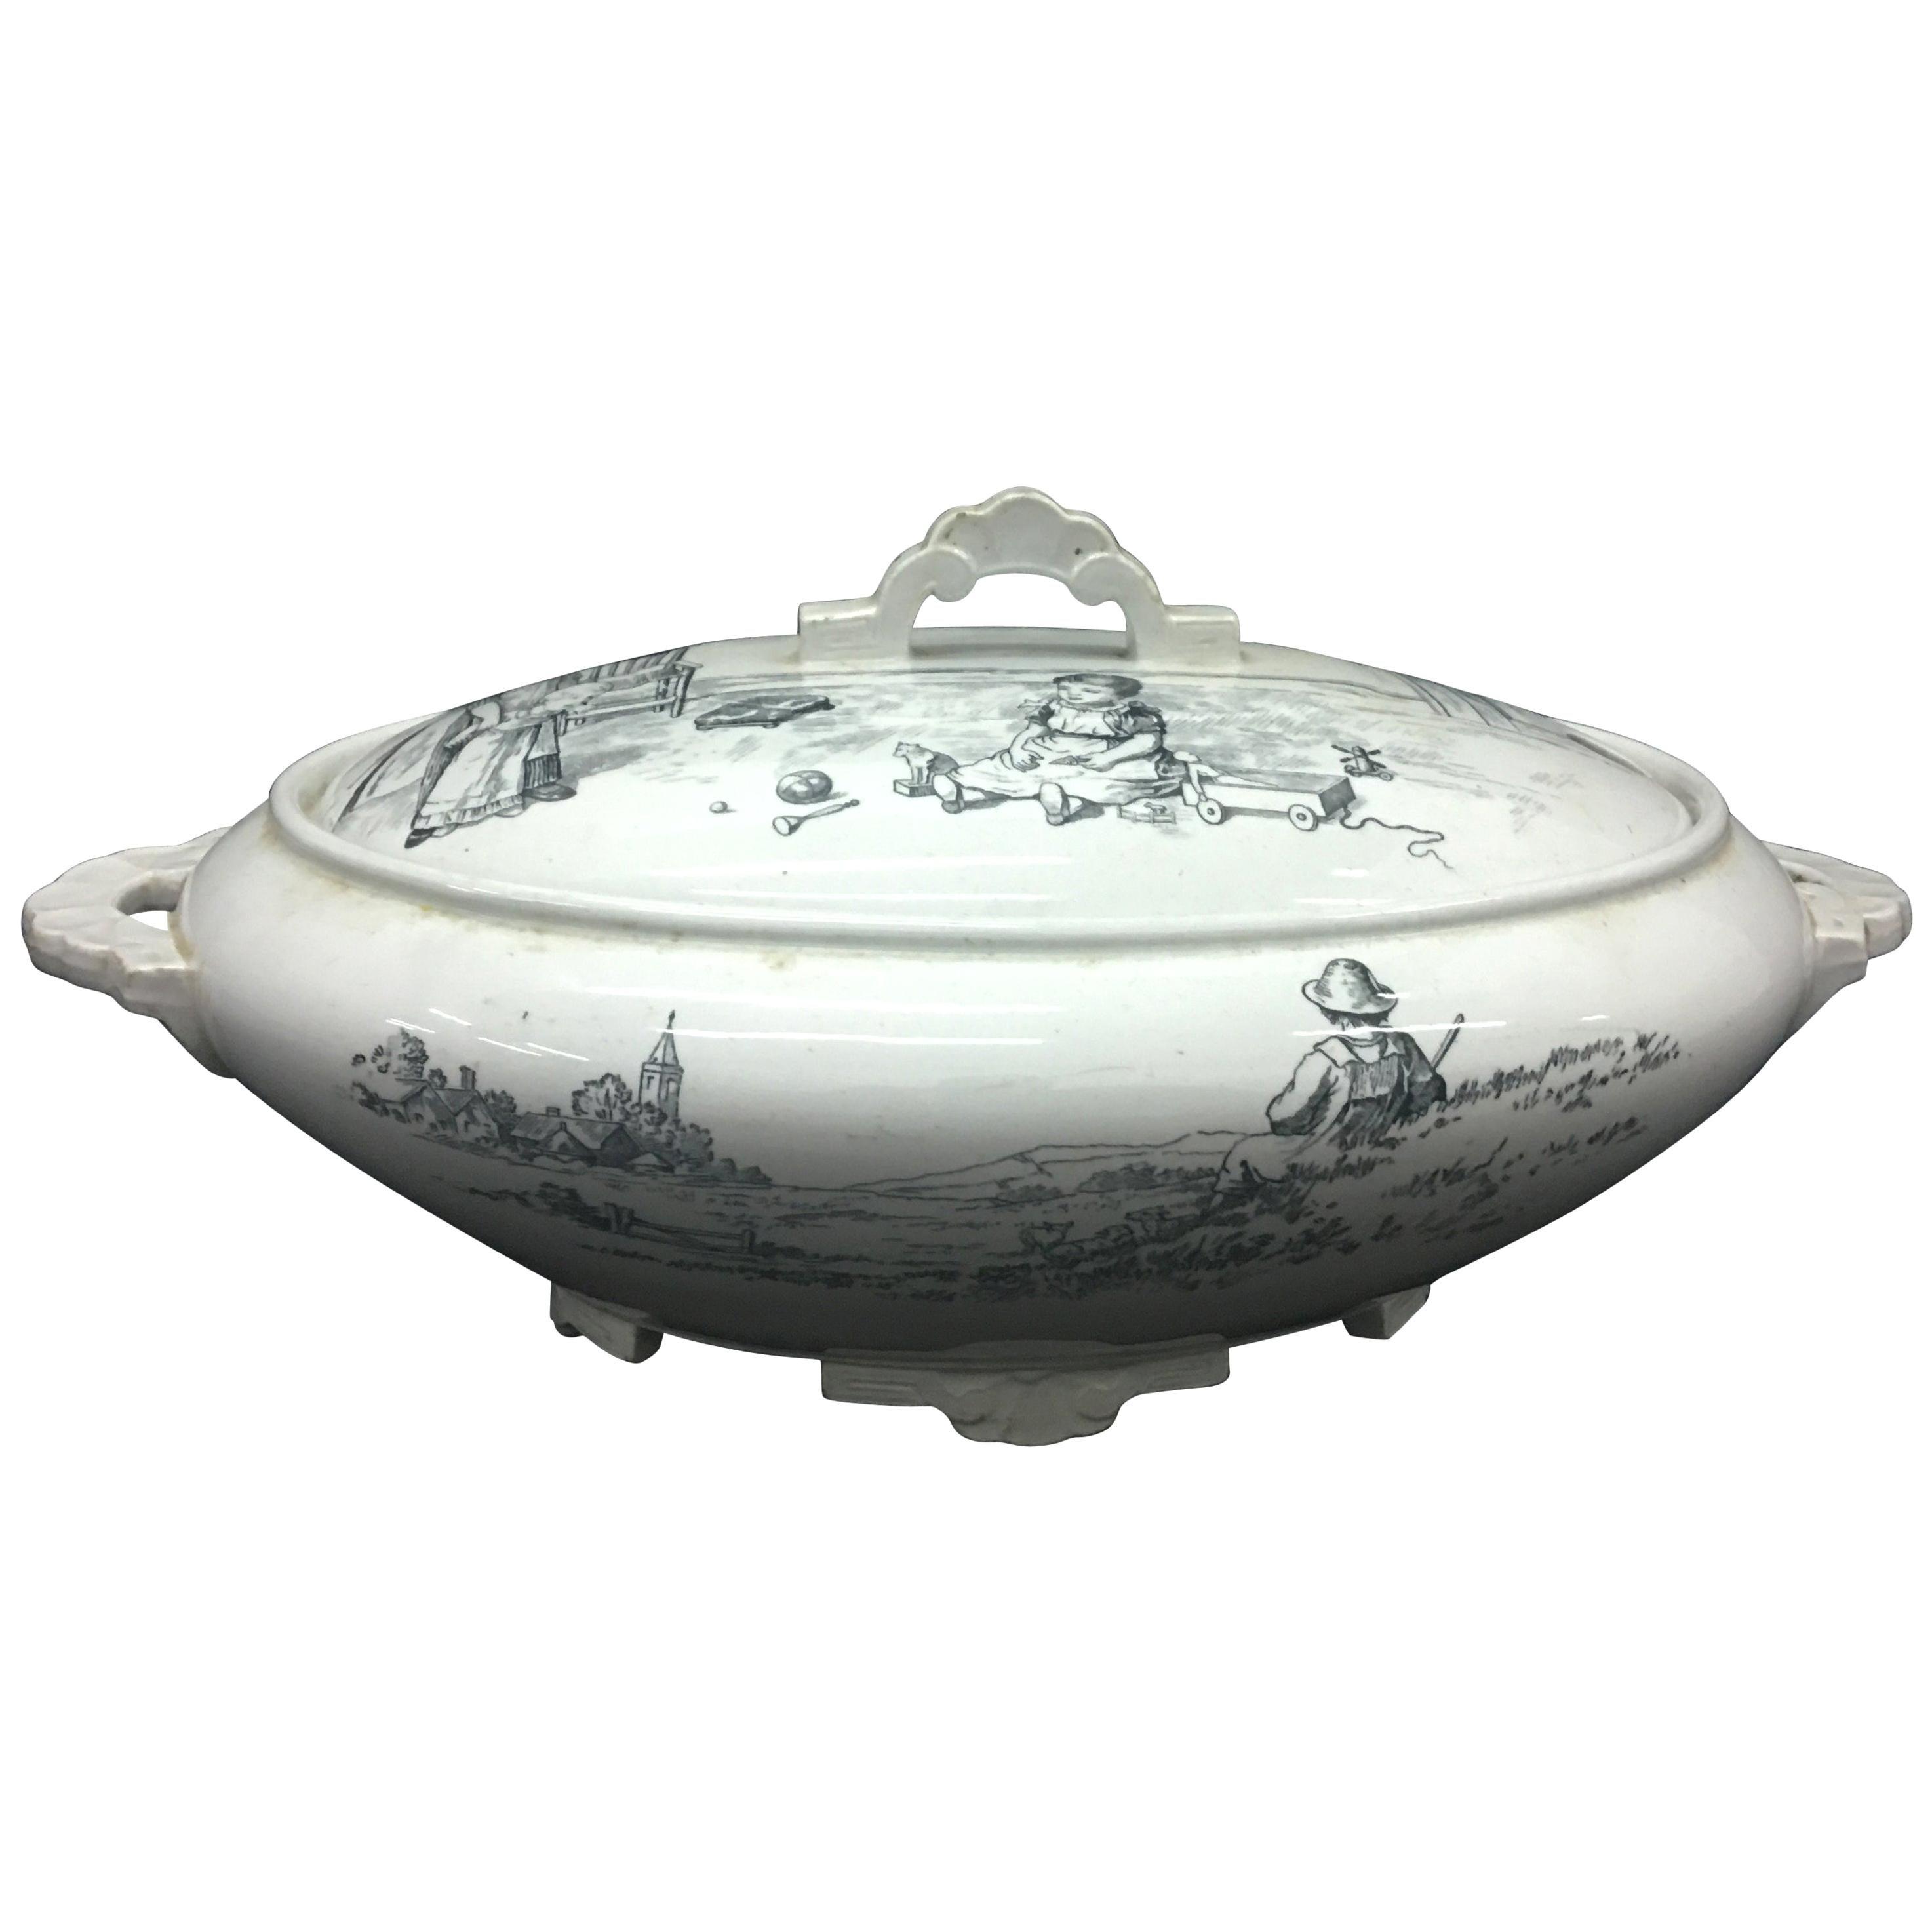 19th Century Victorian Black and White Ceramic British Soup Tureen